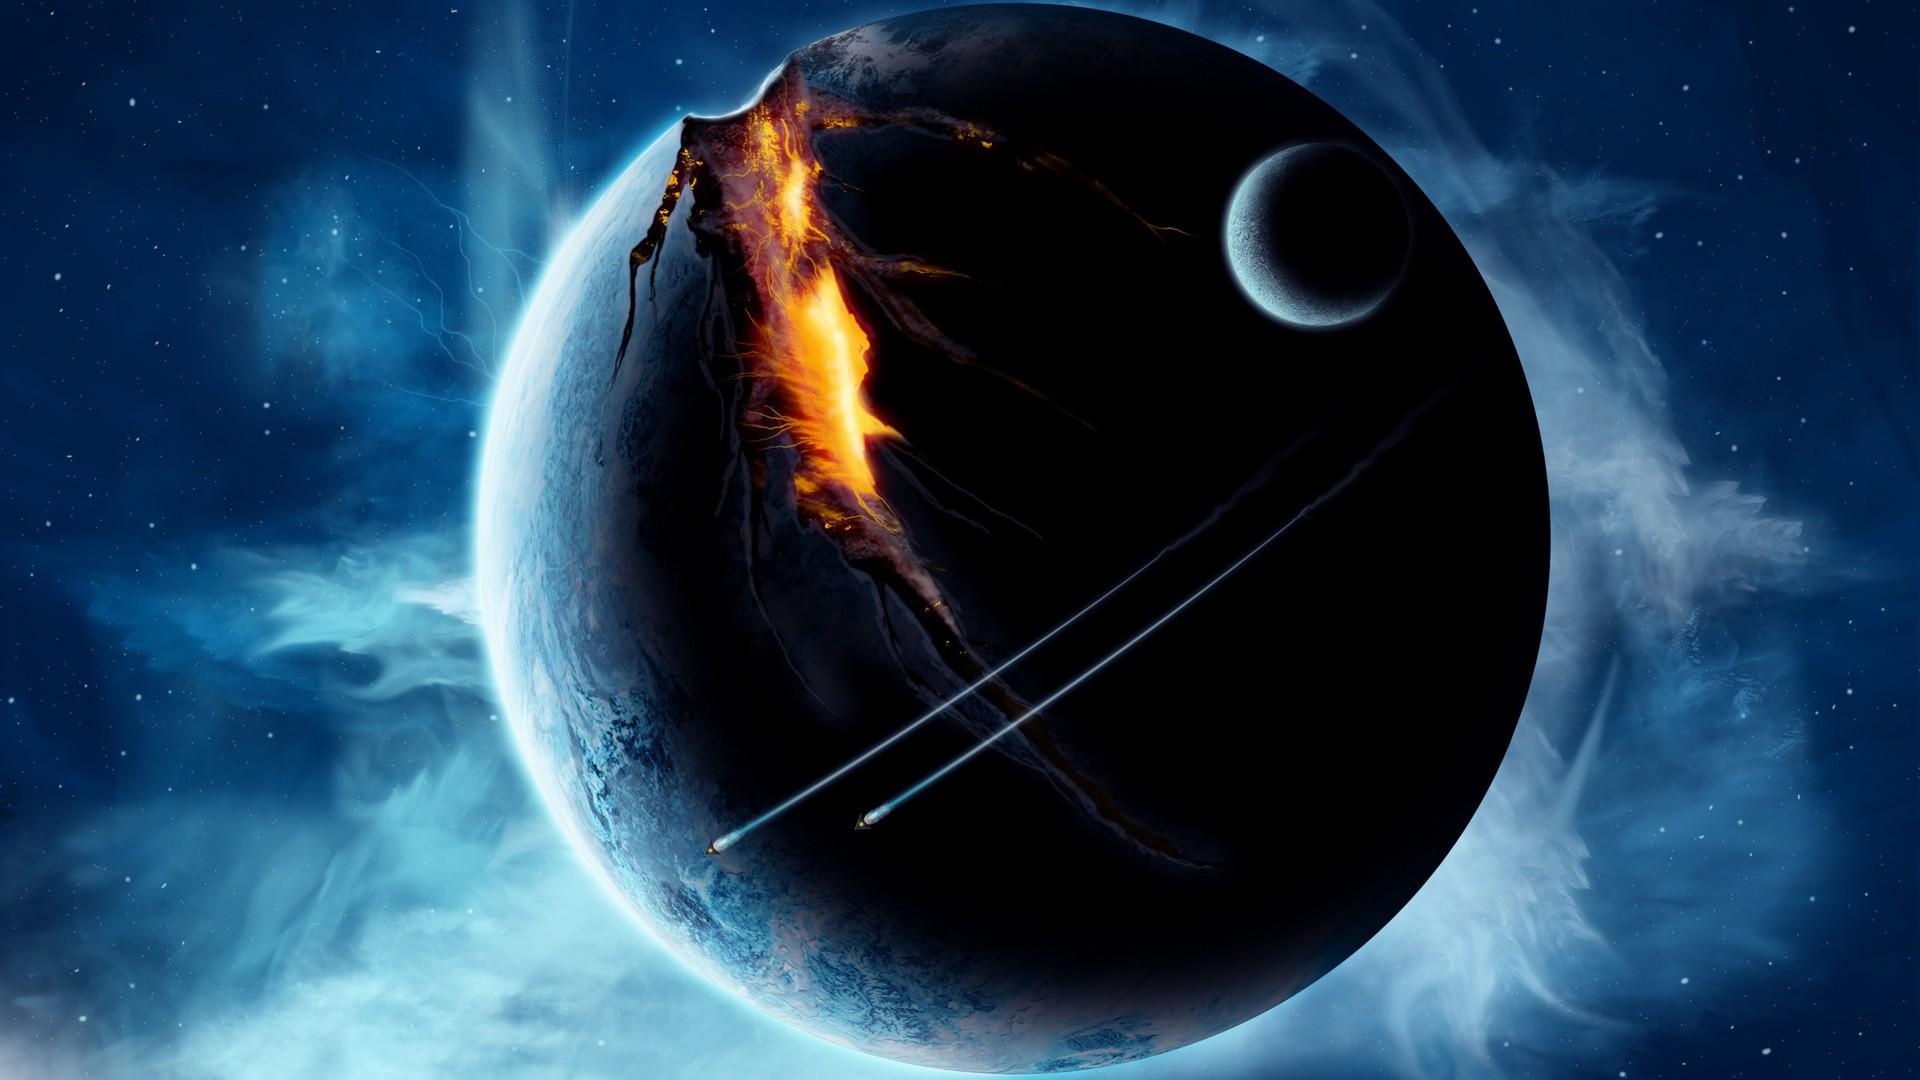 General 1920x1080 digital art space universe spaceship planet stars nebula futuristic fire